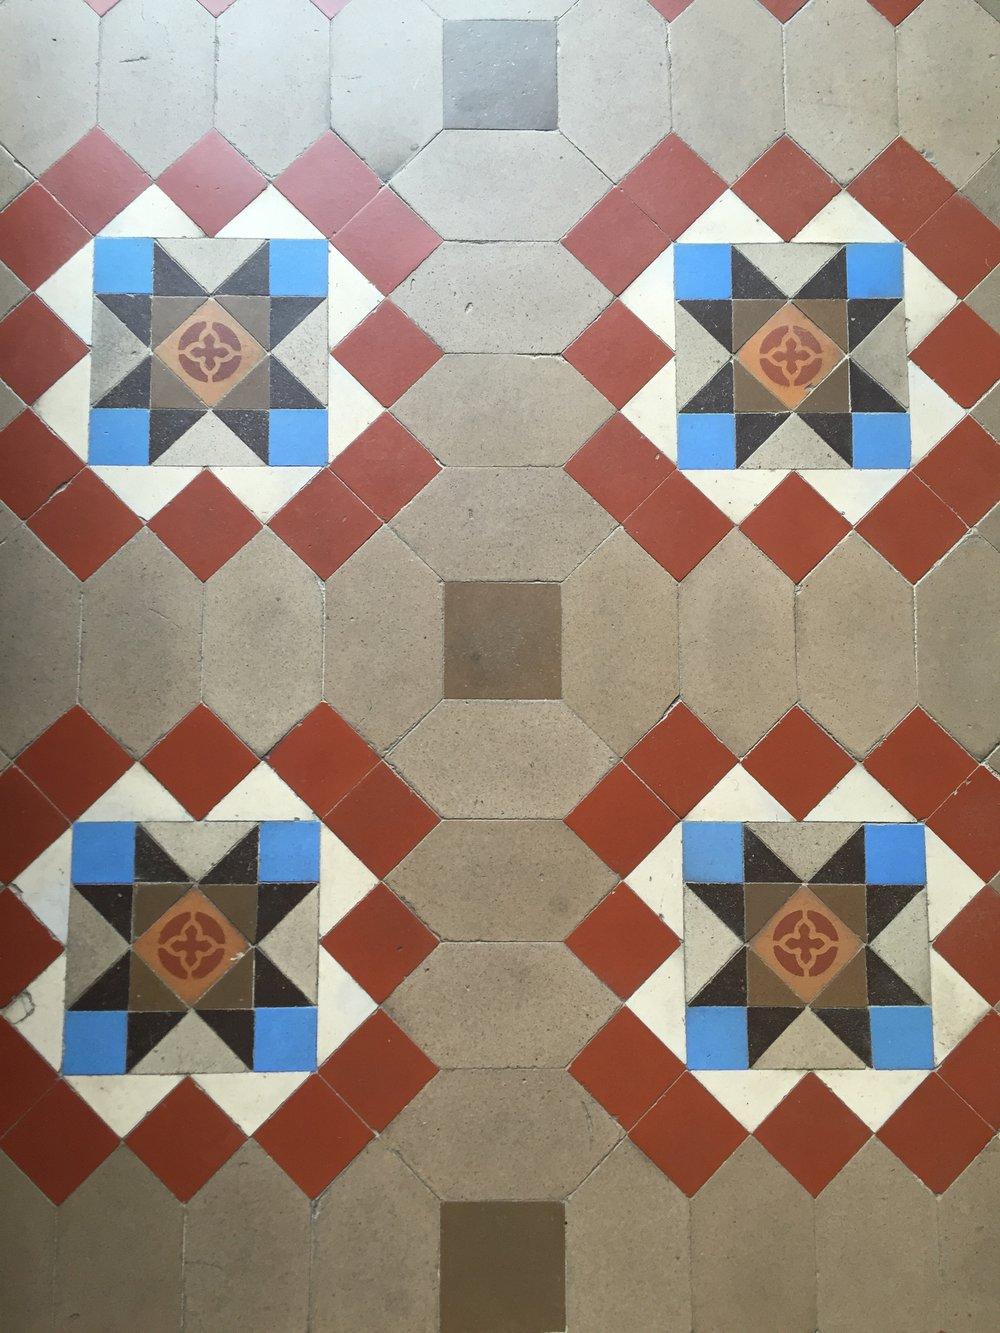 original tiled floors at Casa Bonay